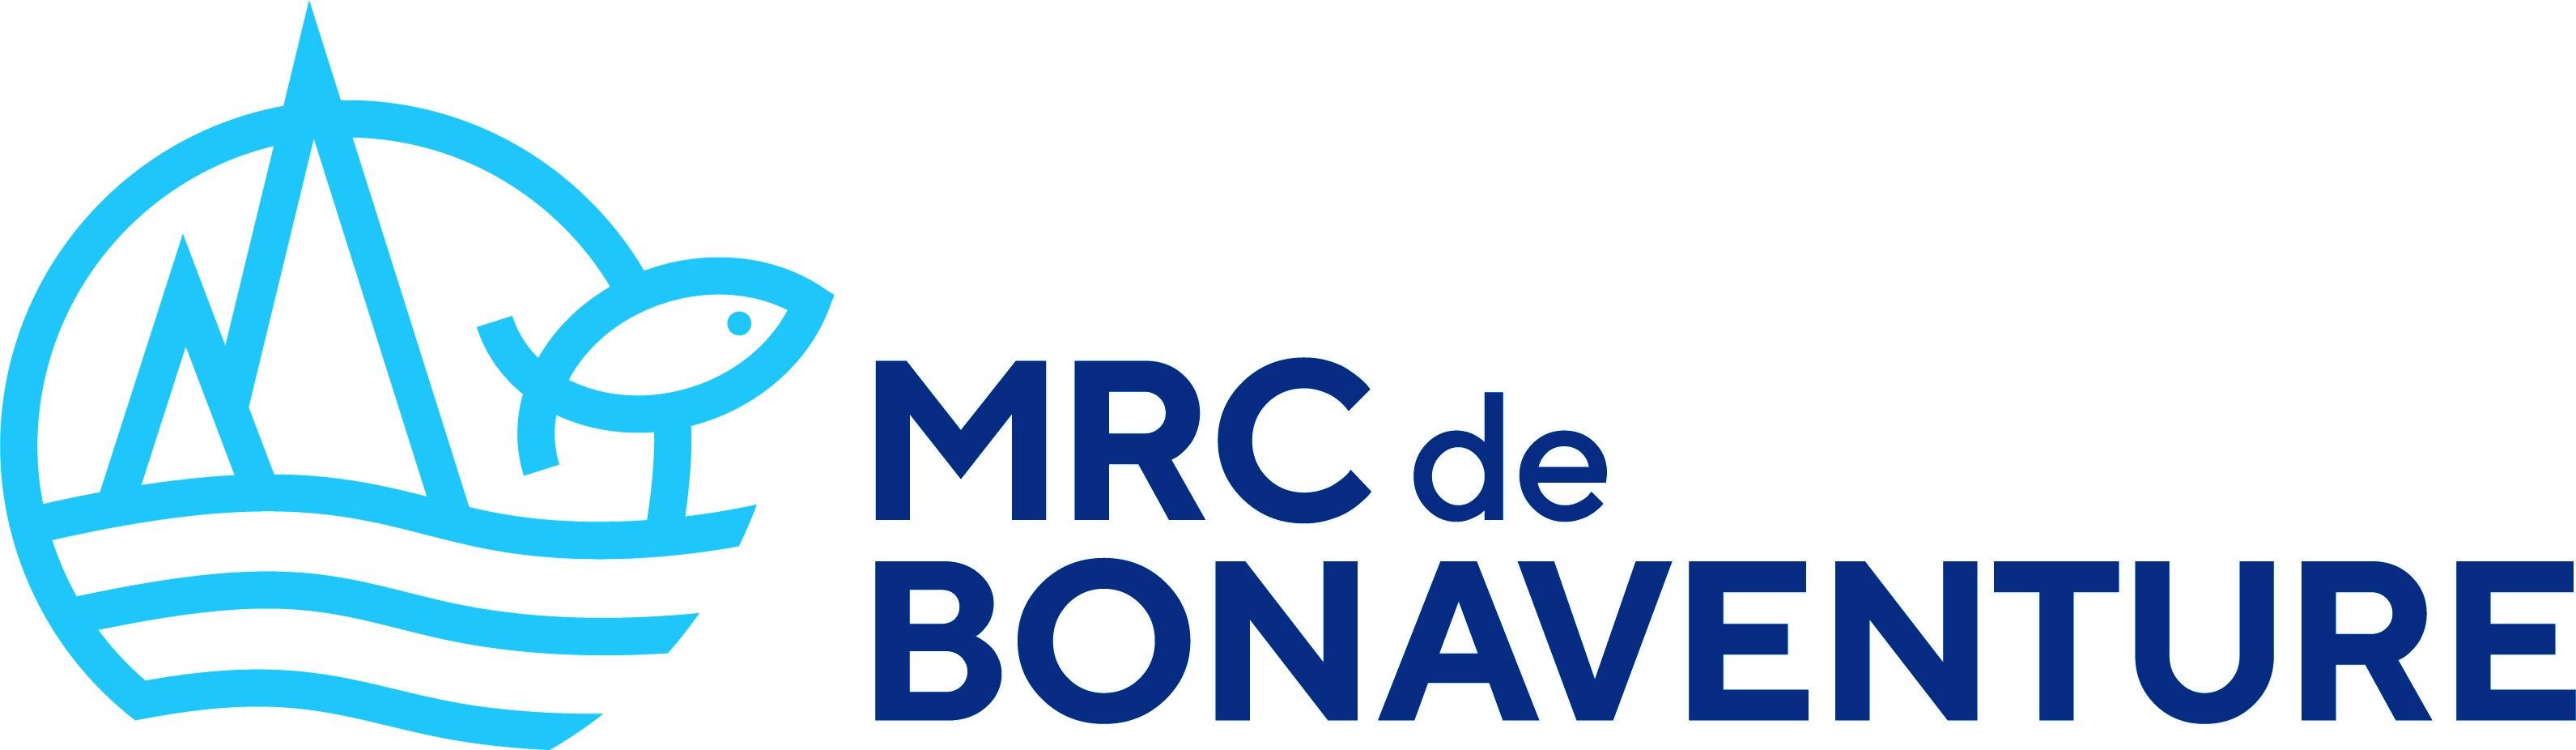 logo_mrc_bonaventure_2018-2